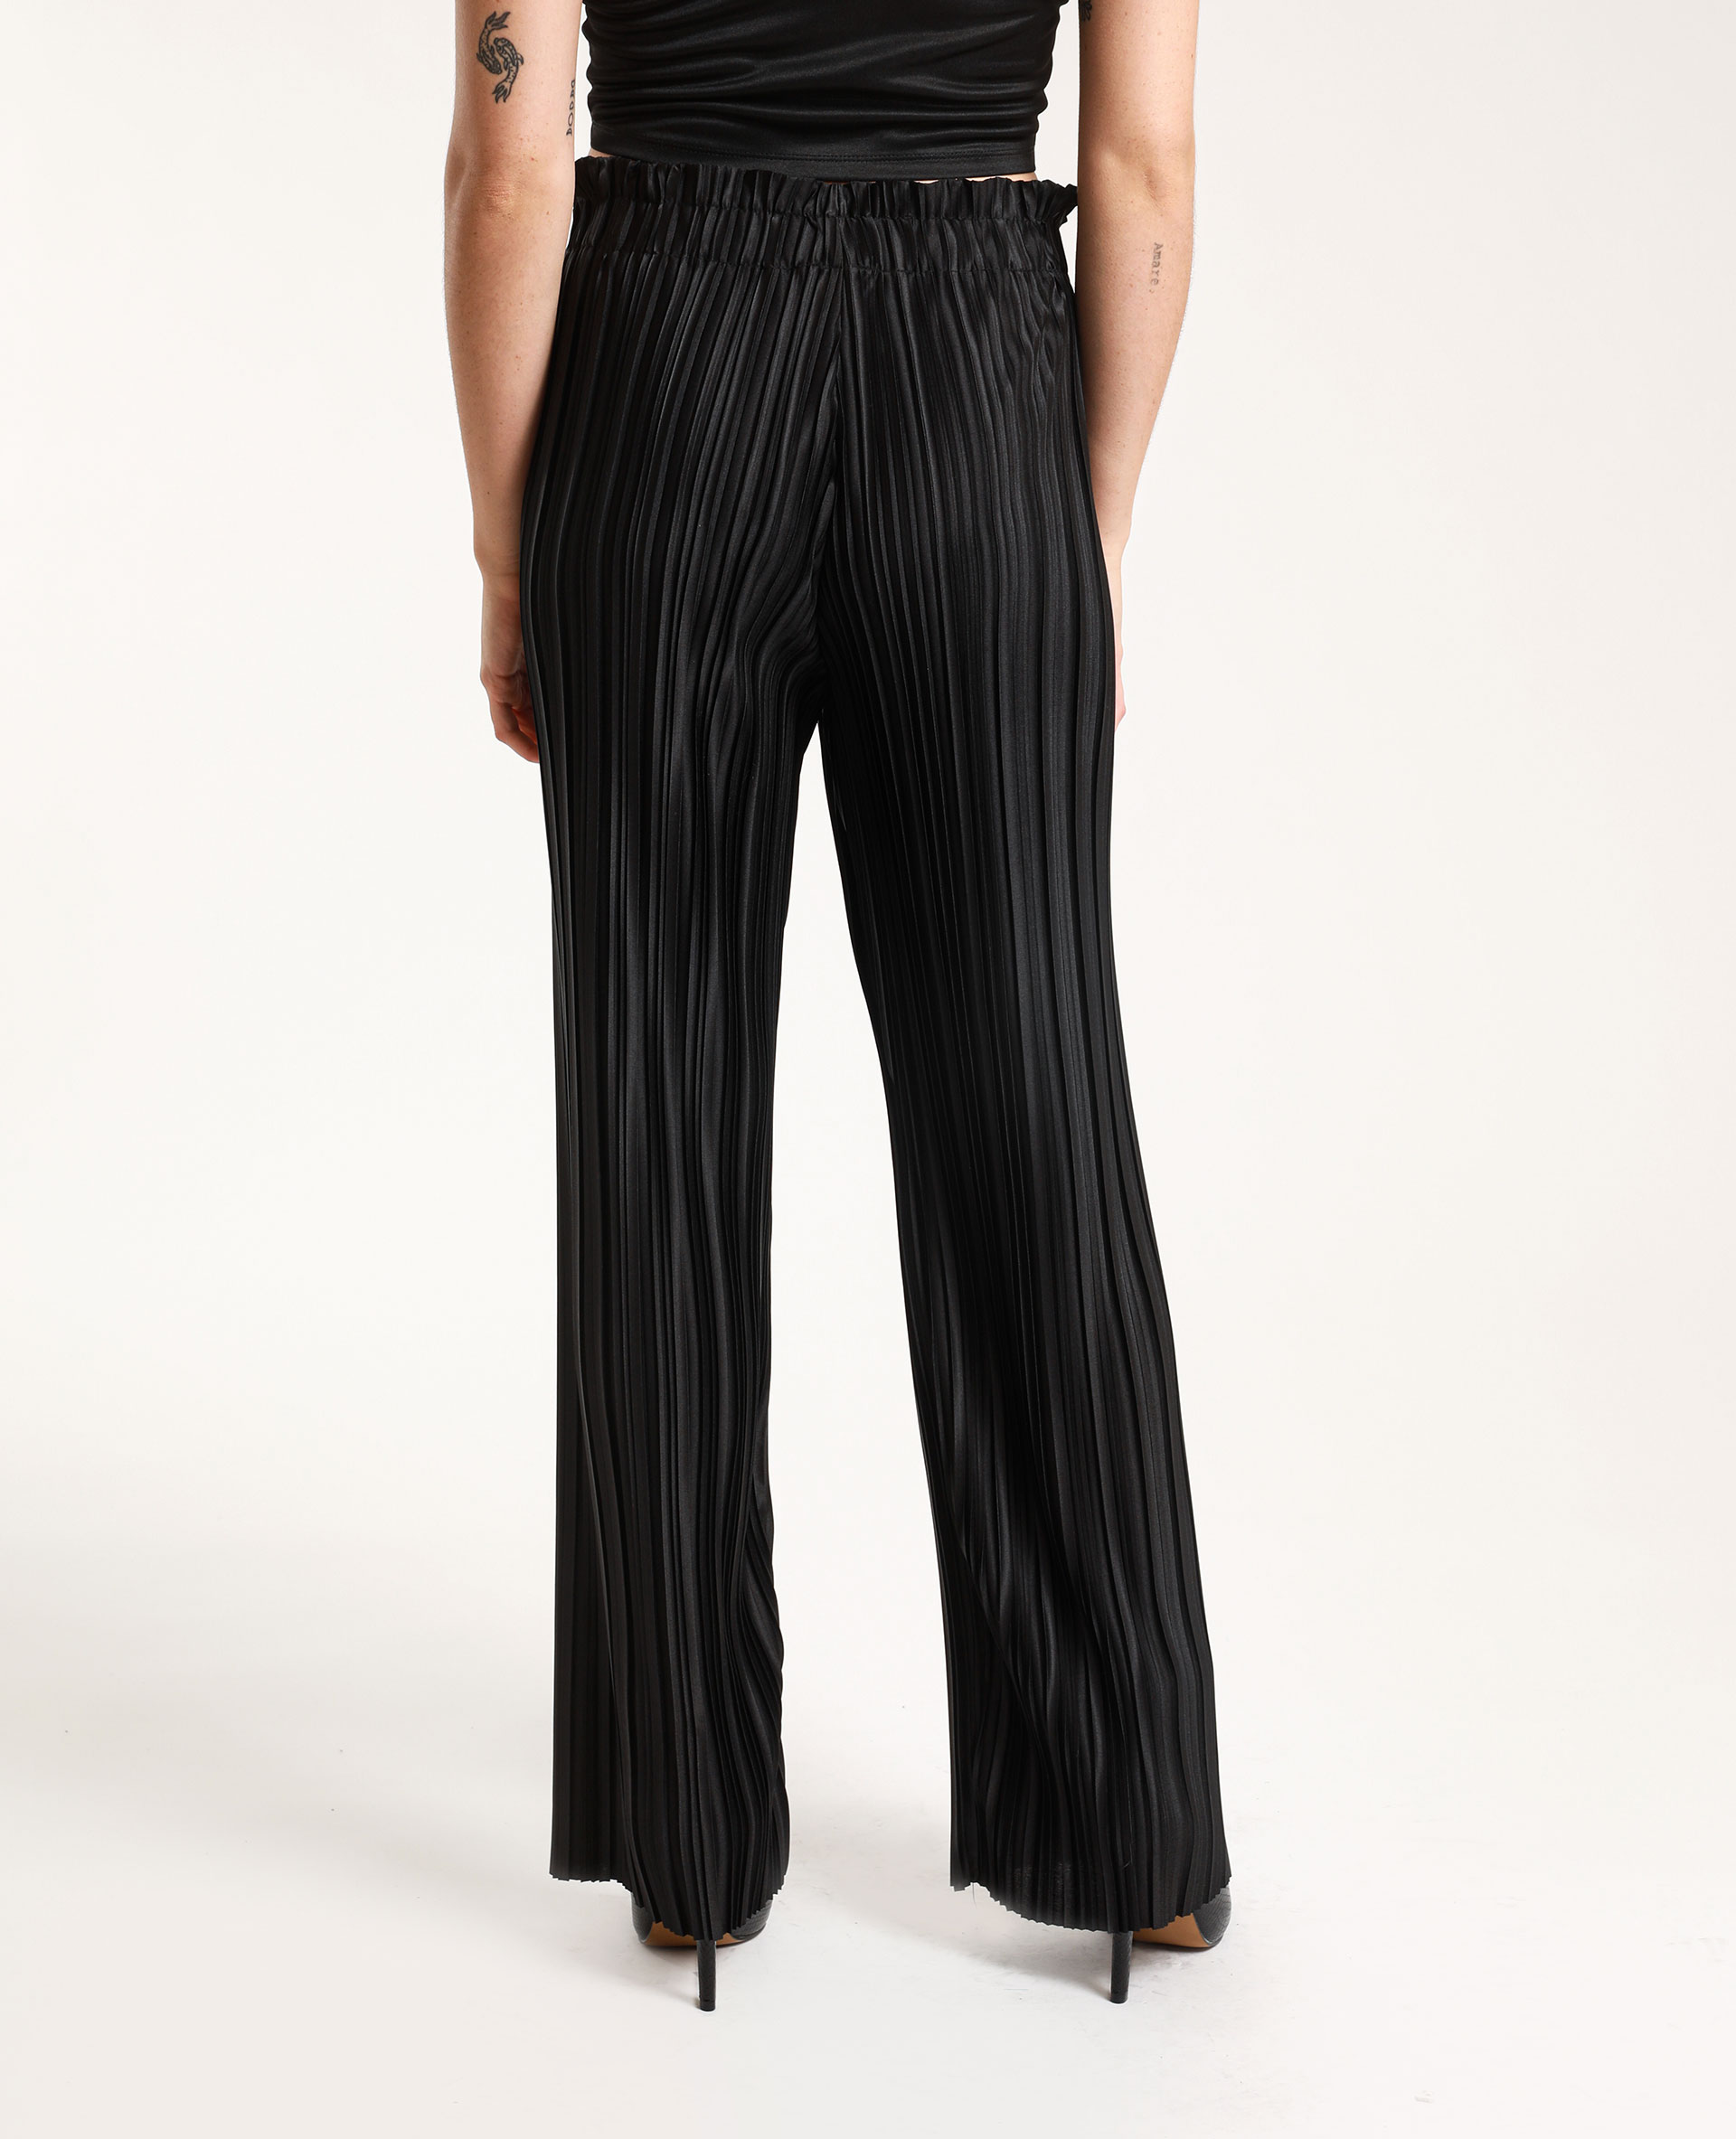 Pantalon plissé noir - Pimkie